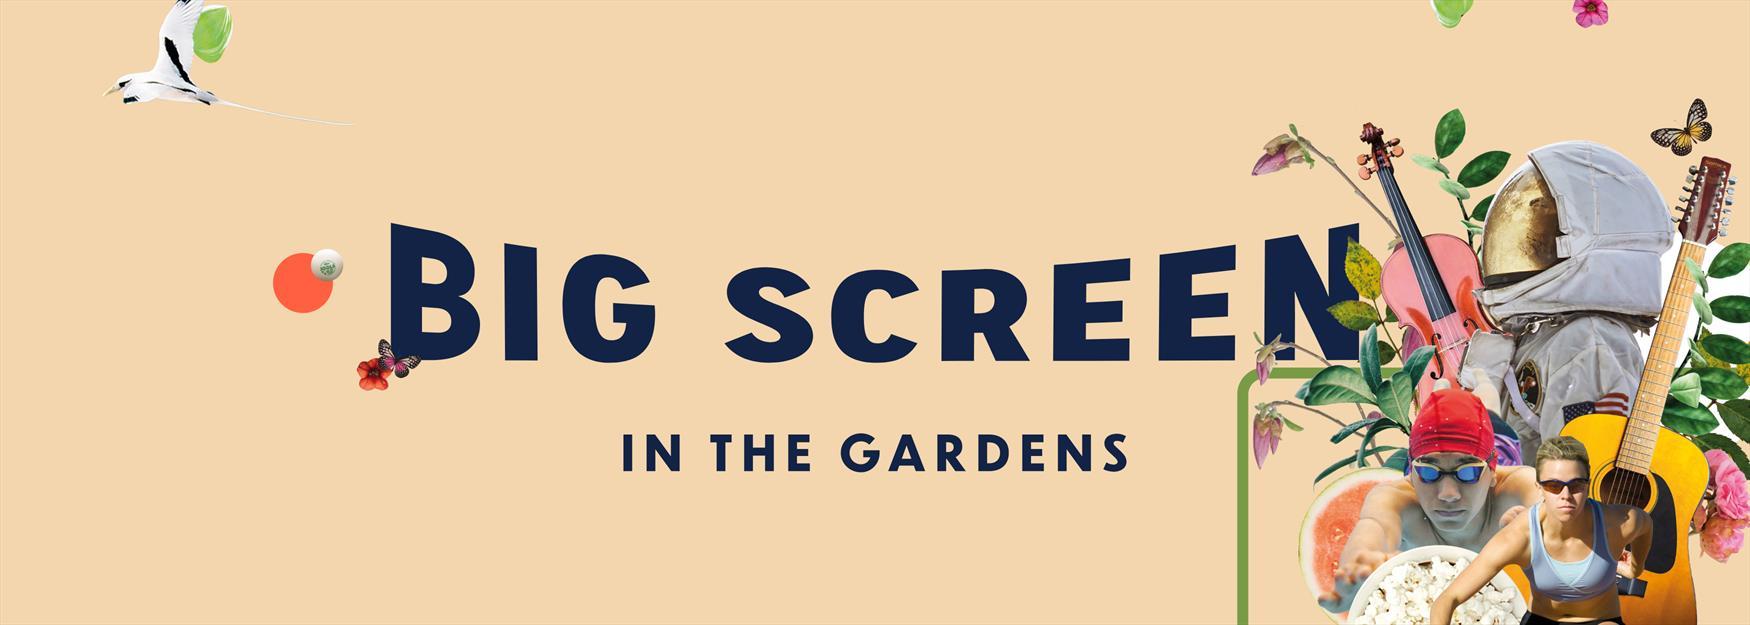 Big Screen in the Gardens, Imperial Gardens, Cheltenham